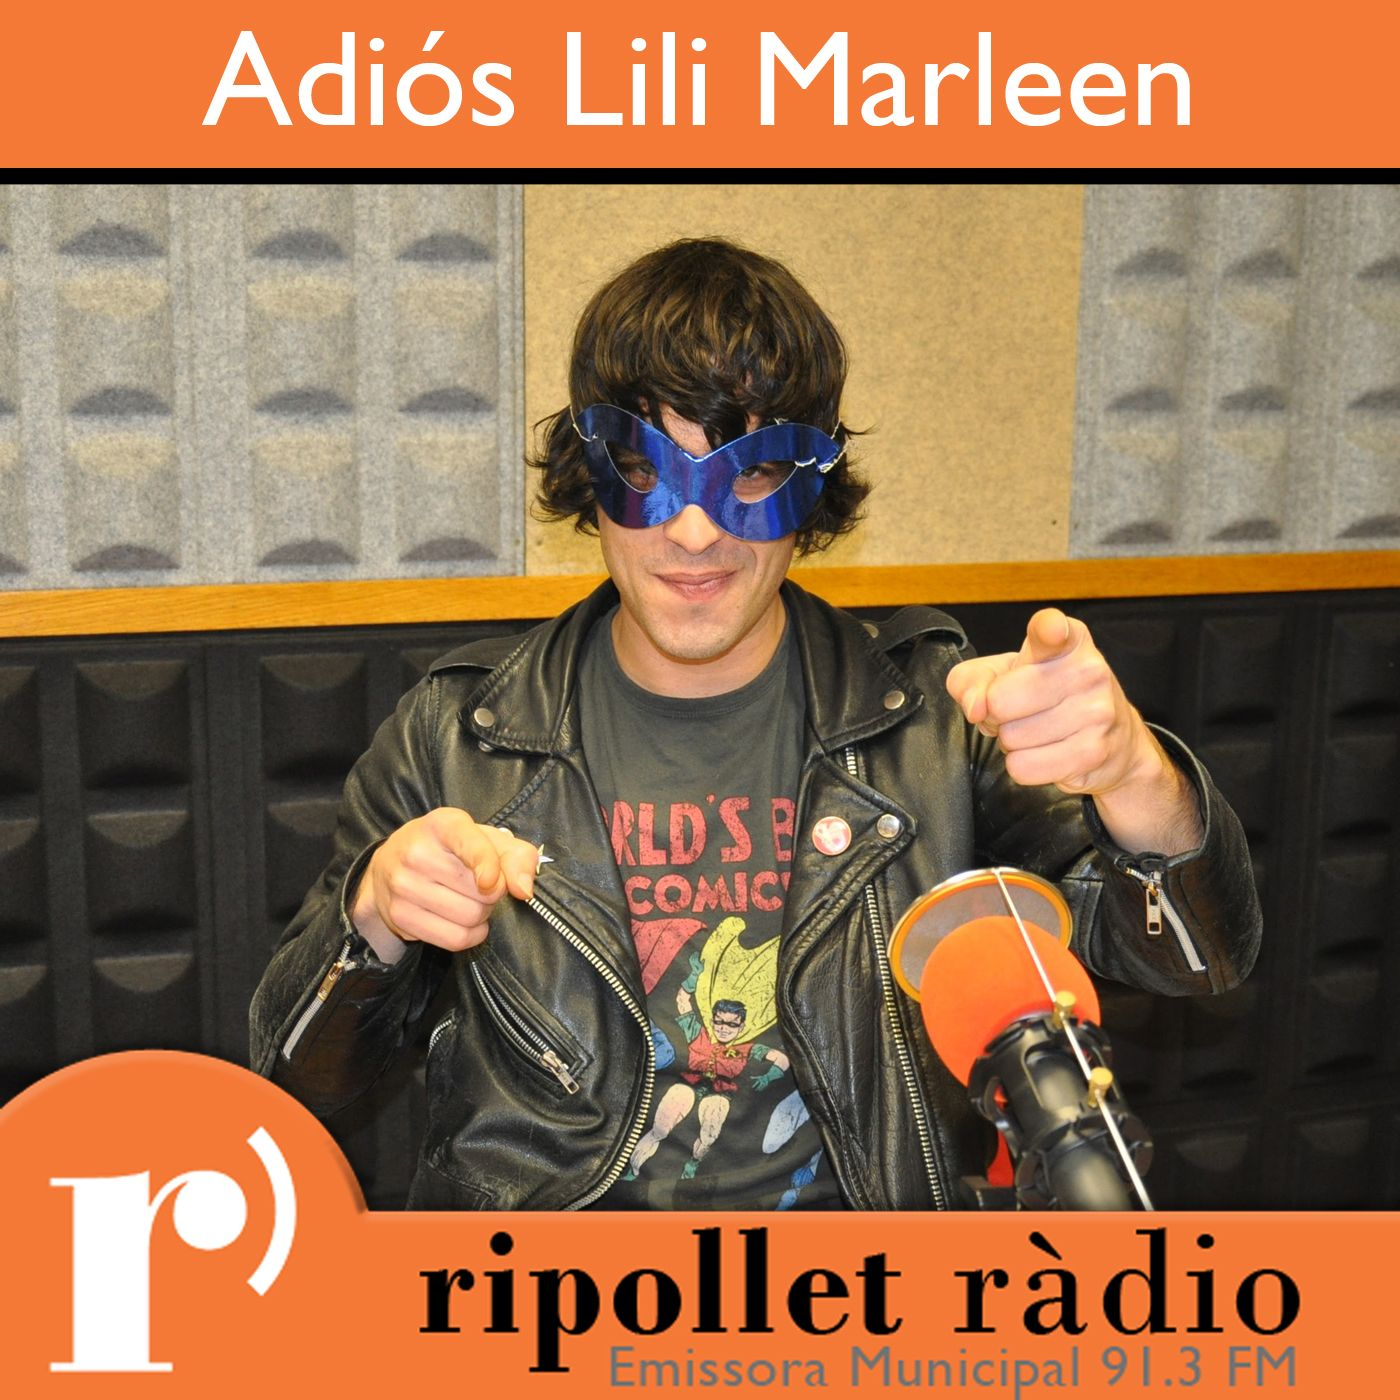 Adiós Lili Marleen